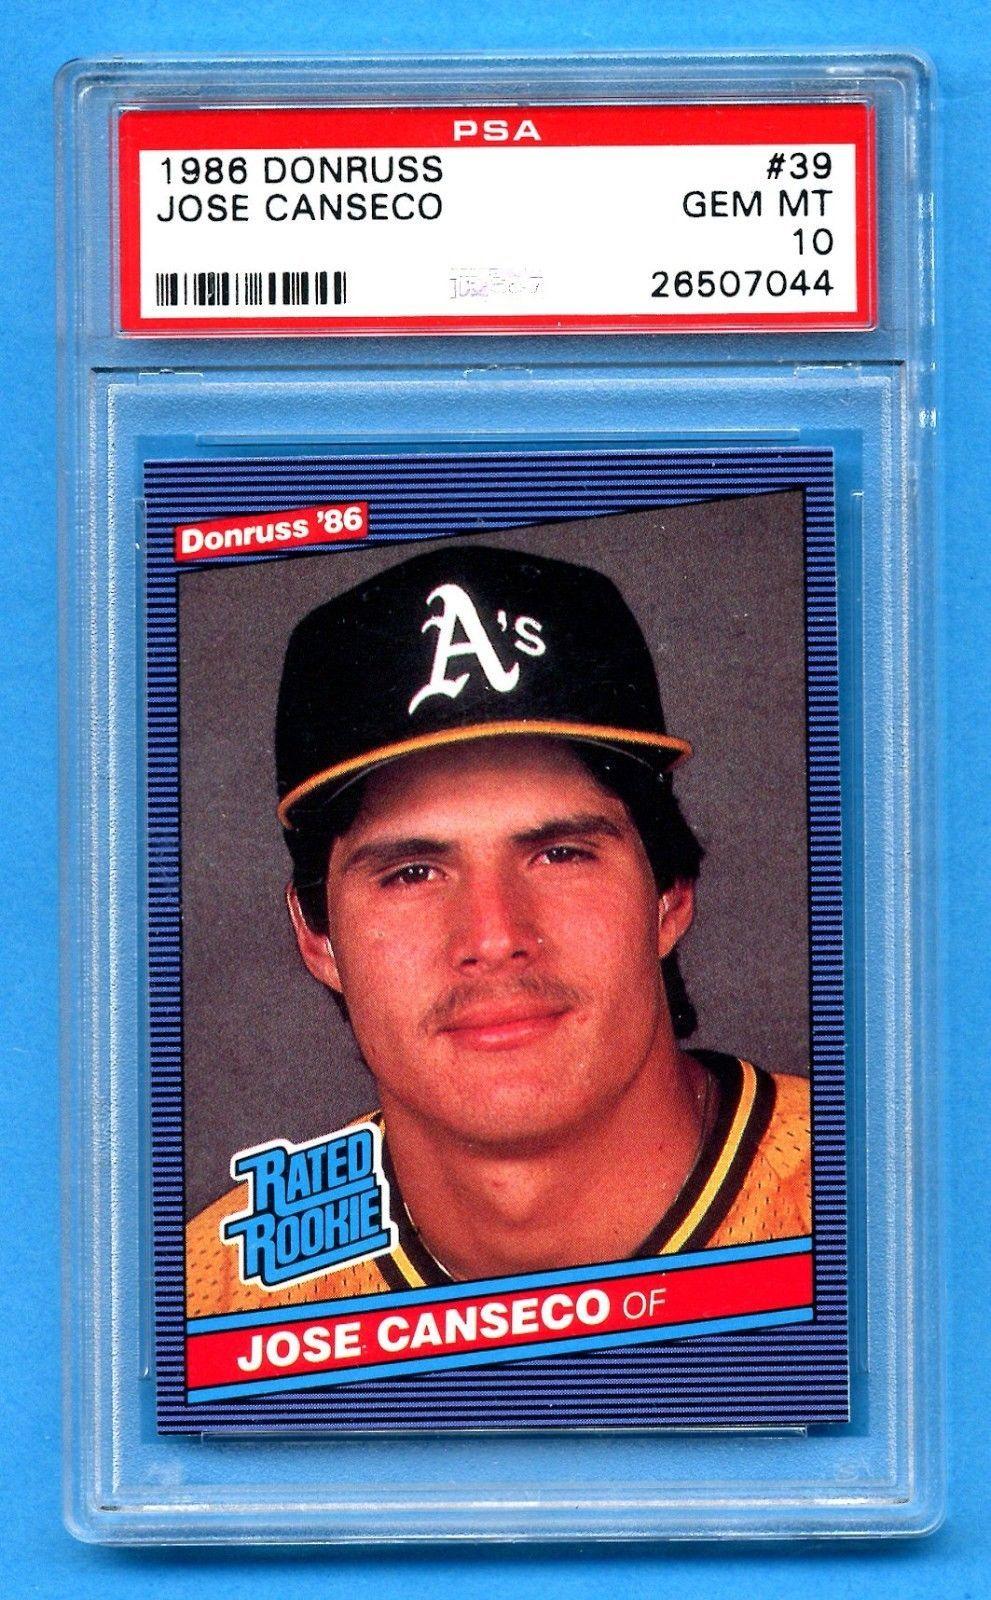 1986 donruss jose canseco rookie card psa 10 gem mint